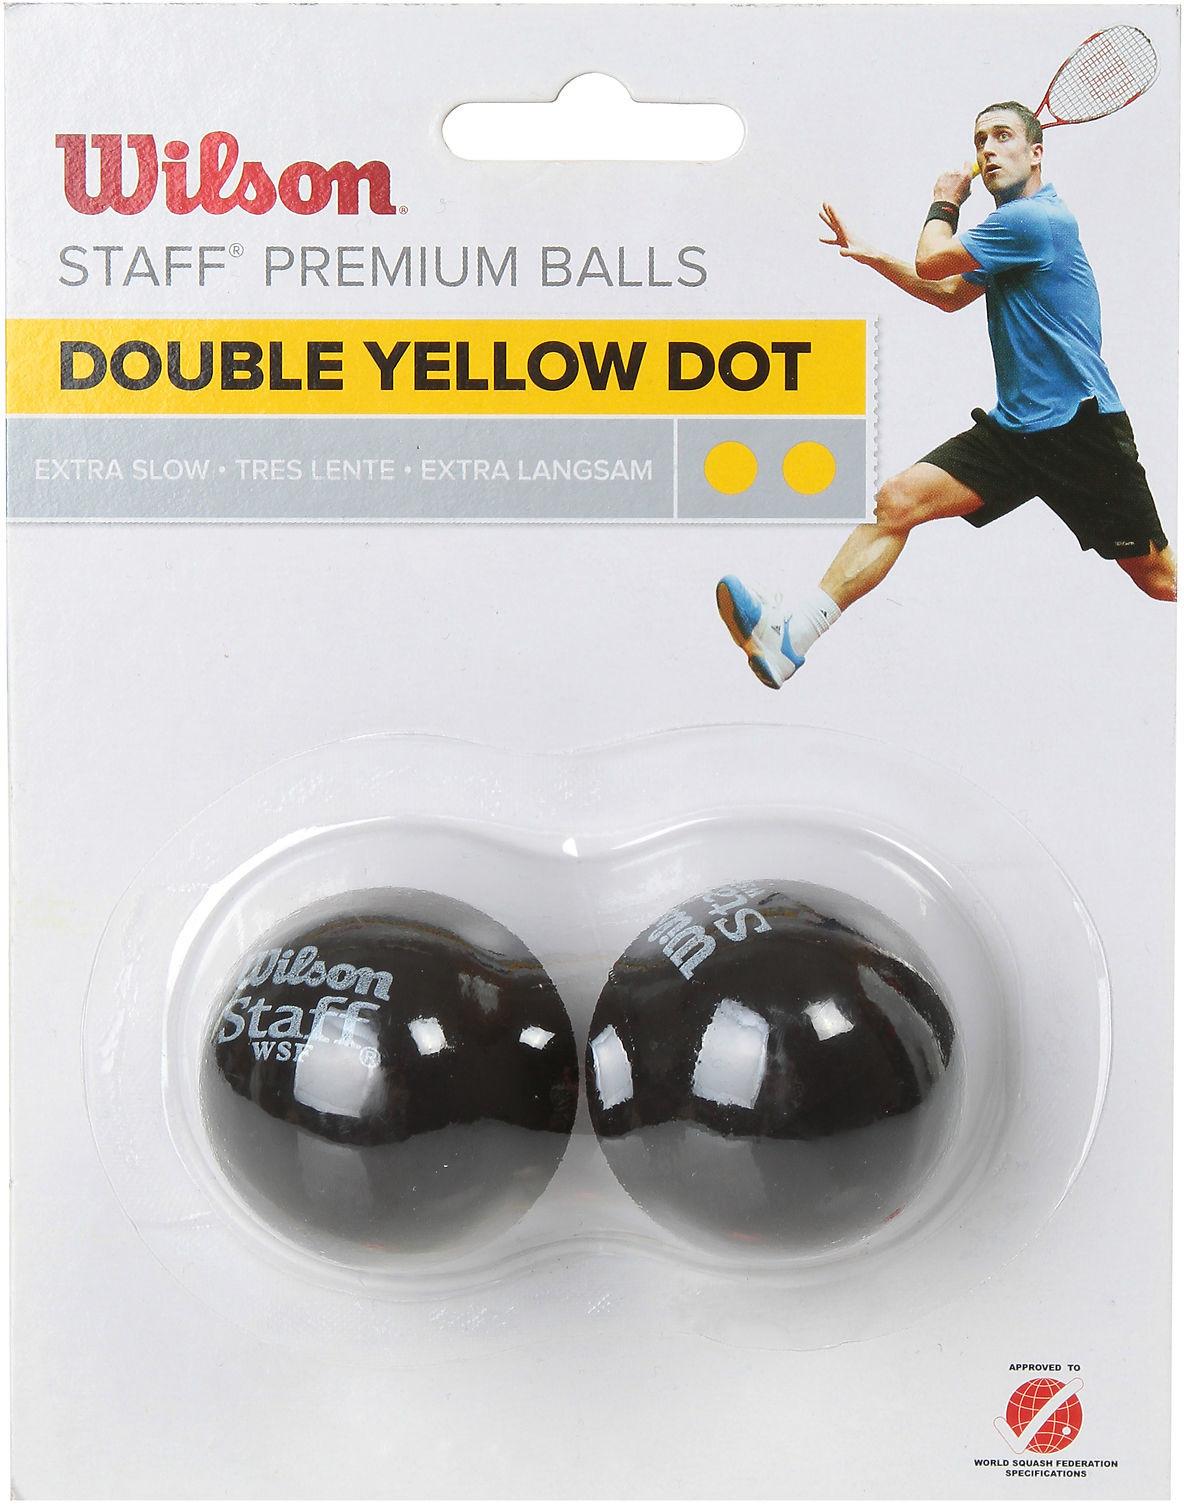 Wilson Piłki sq DY WRT617600 WRT617600